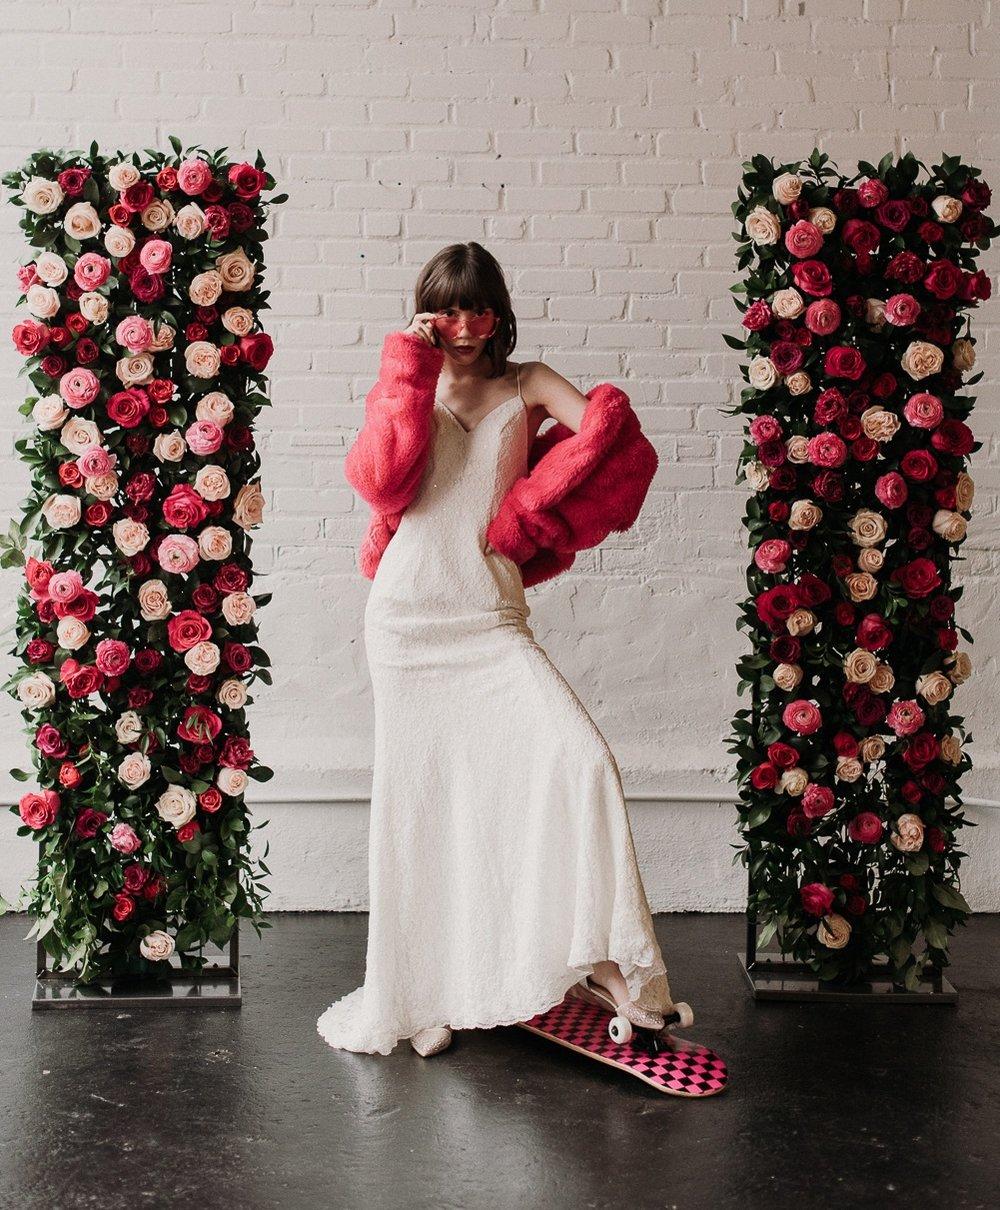 Lyra+Vega+Bridal+-+Ria+MacKenzie+Photography+-+Girl+Power_-197.jpg